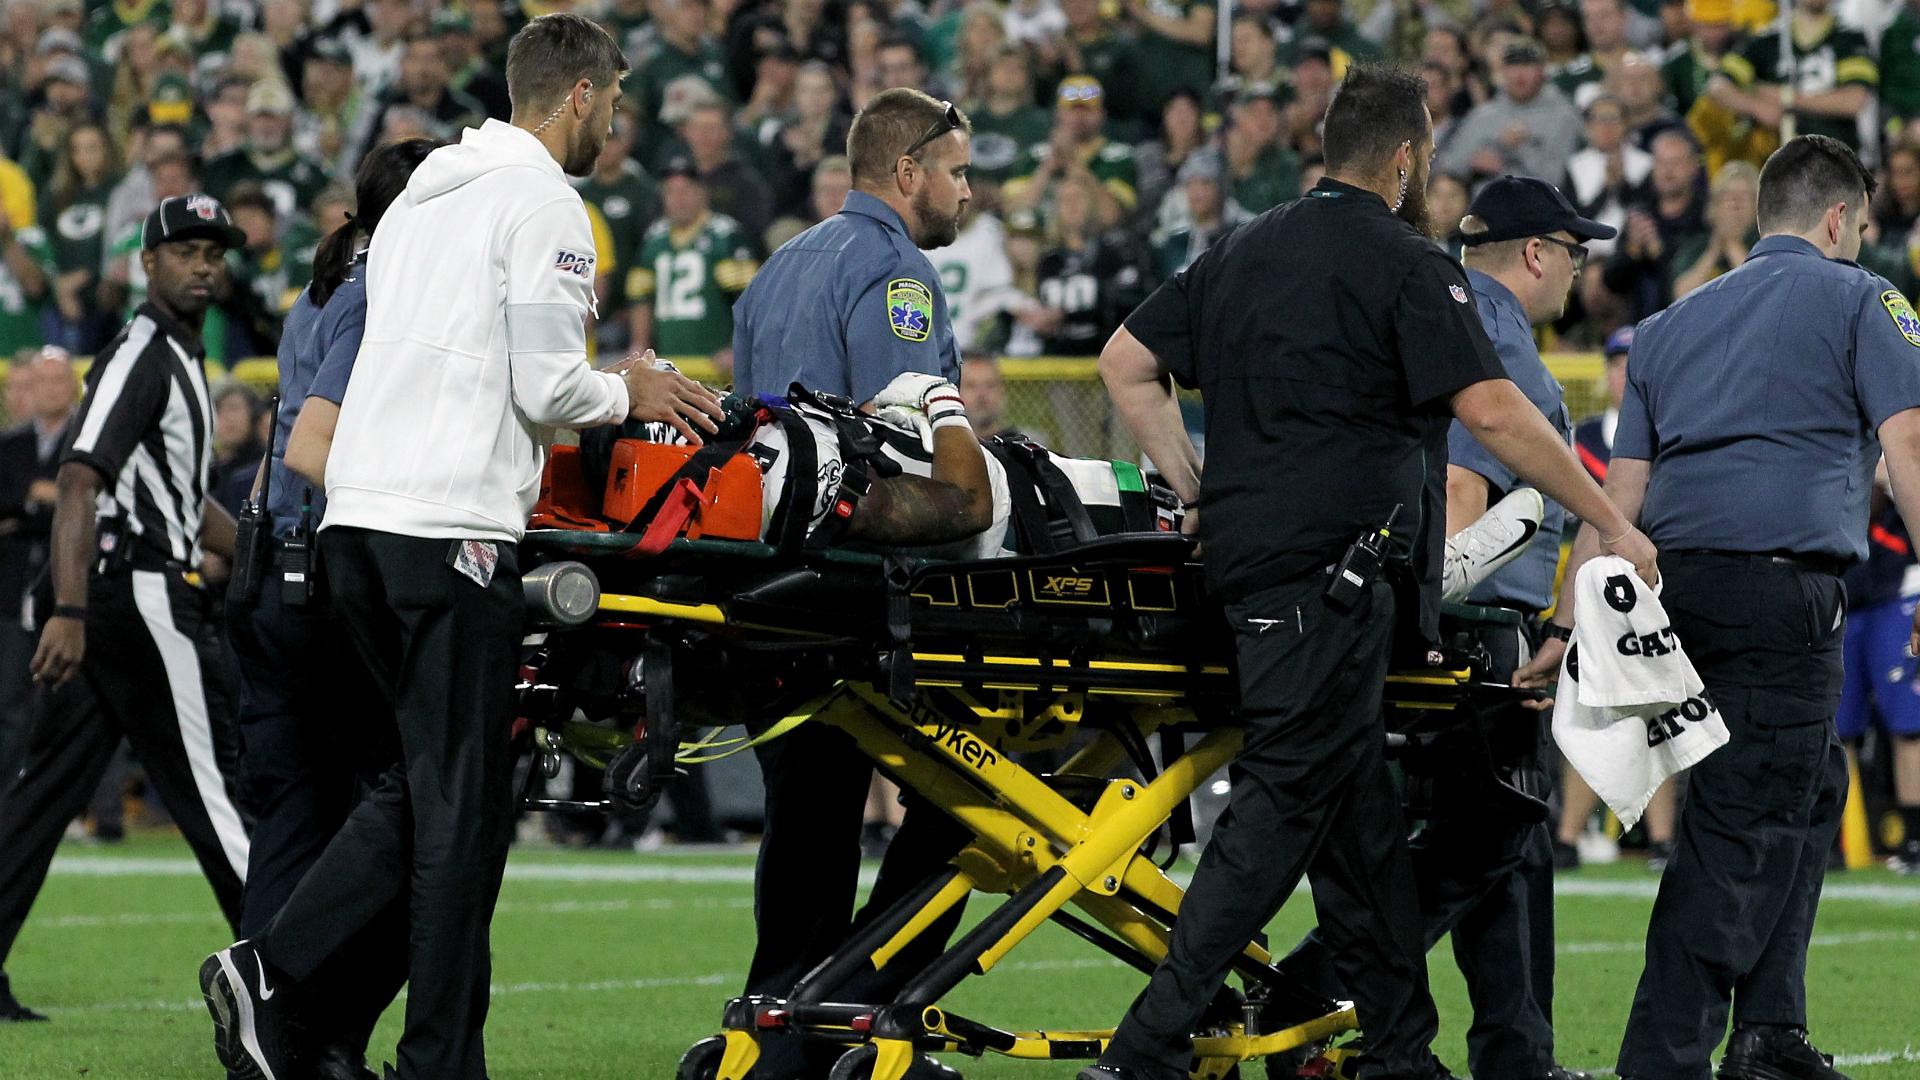 Maddox taken to hospital